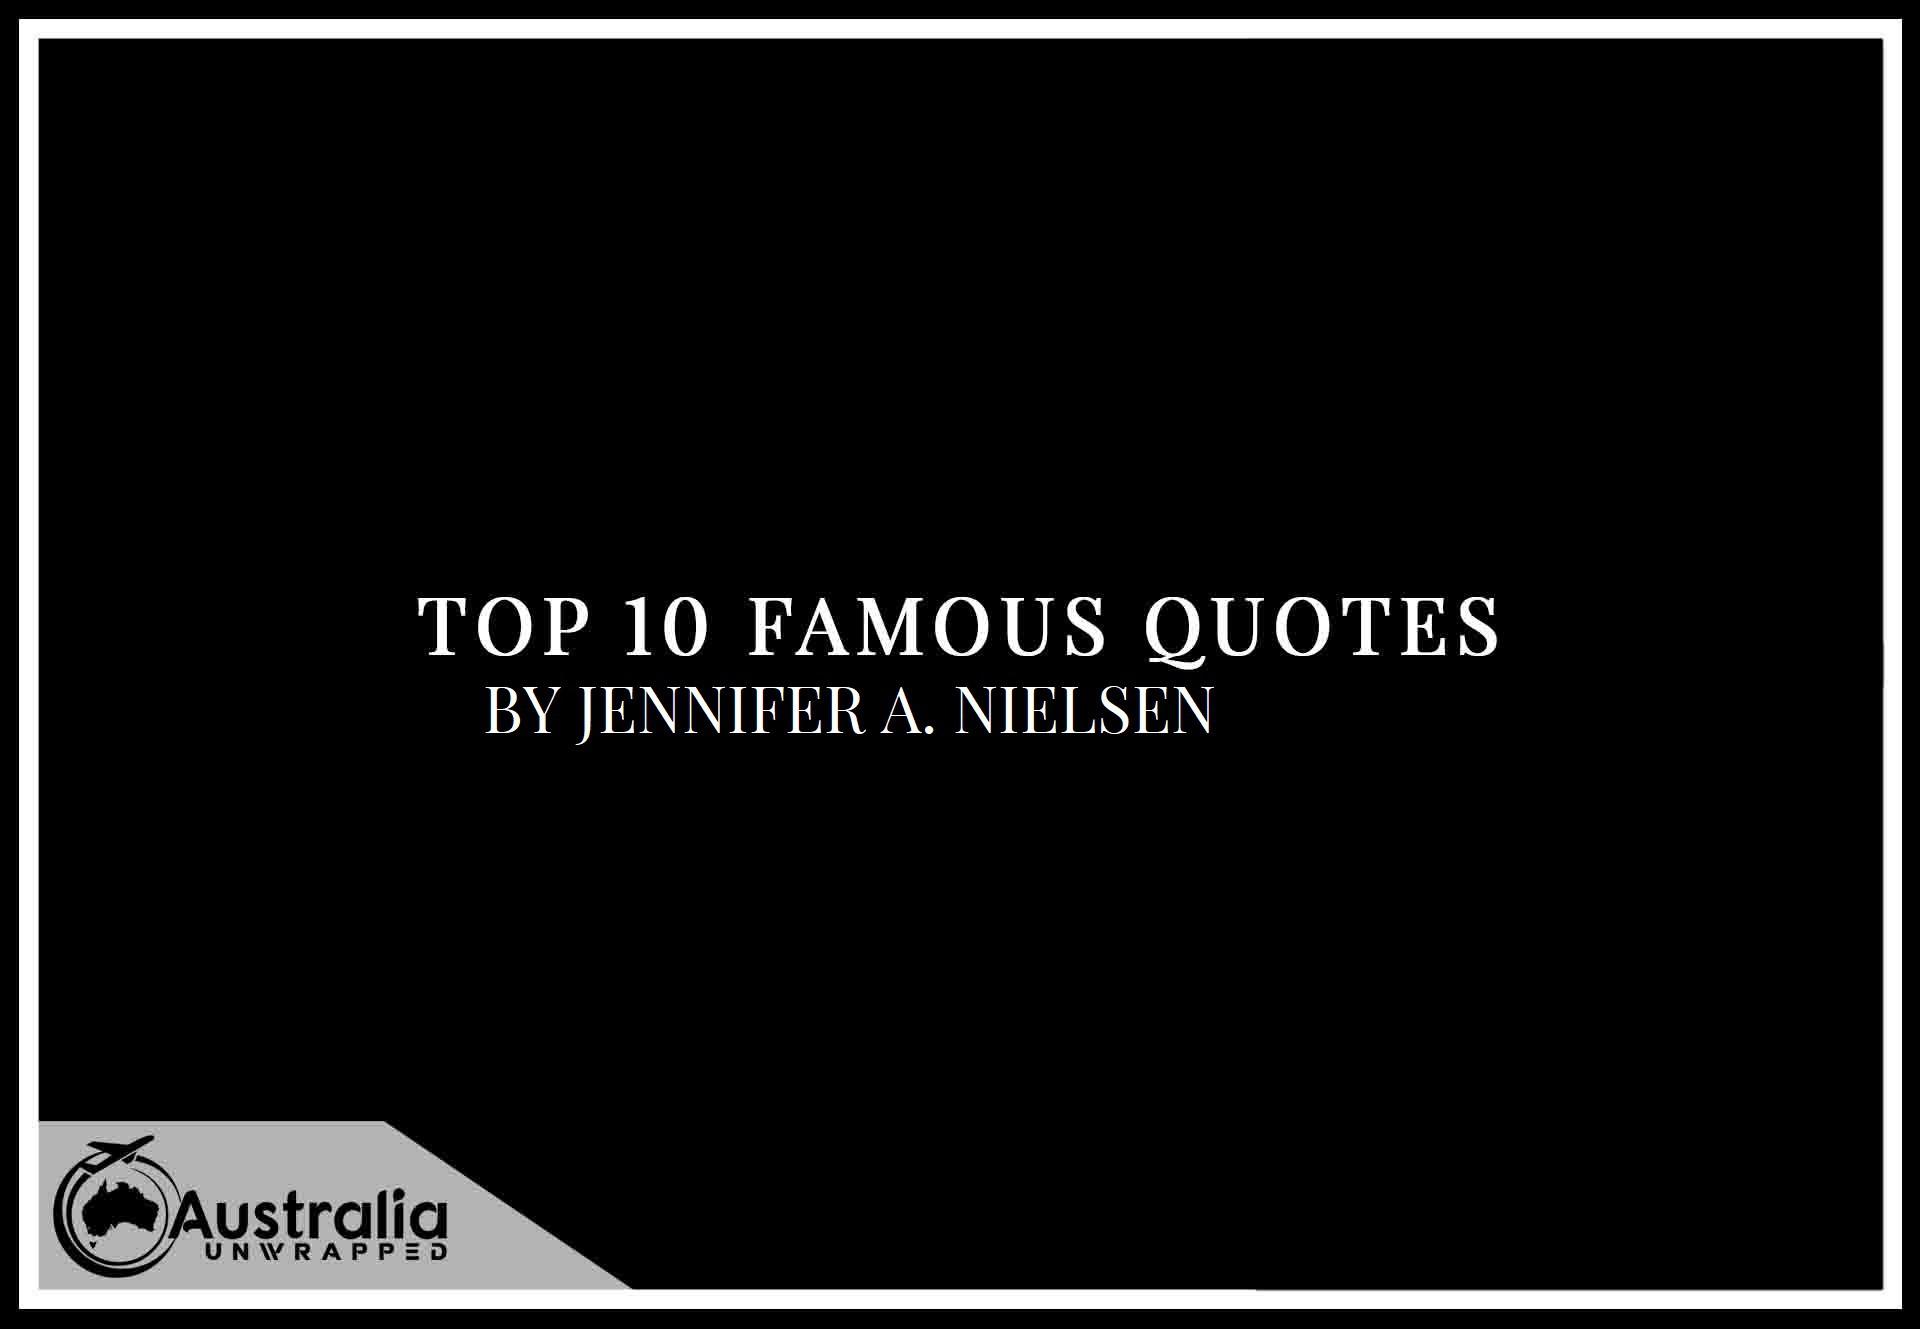 Top 10 Famous Quotes by Author Jennifer A. Nielsen